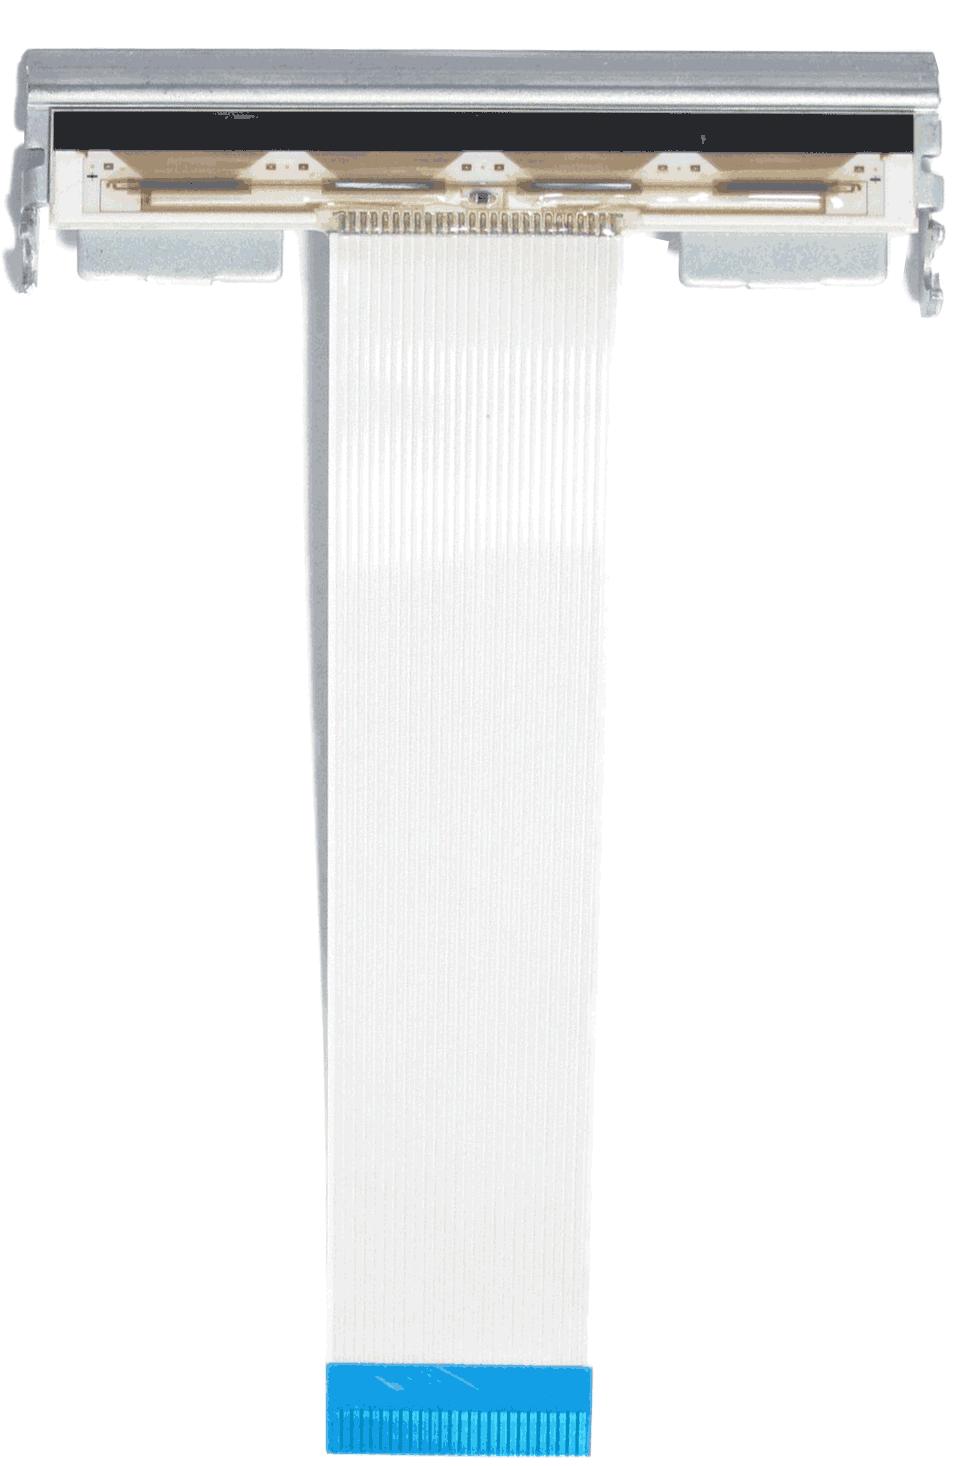 Epson TM-T88VI Print Head (TM338APH)